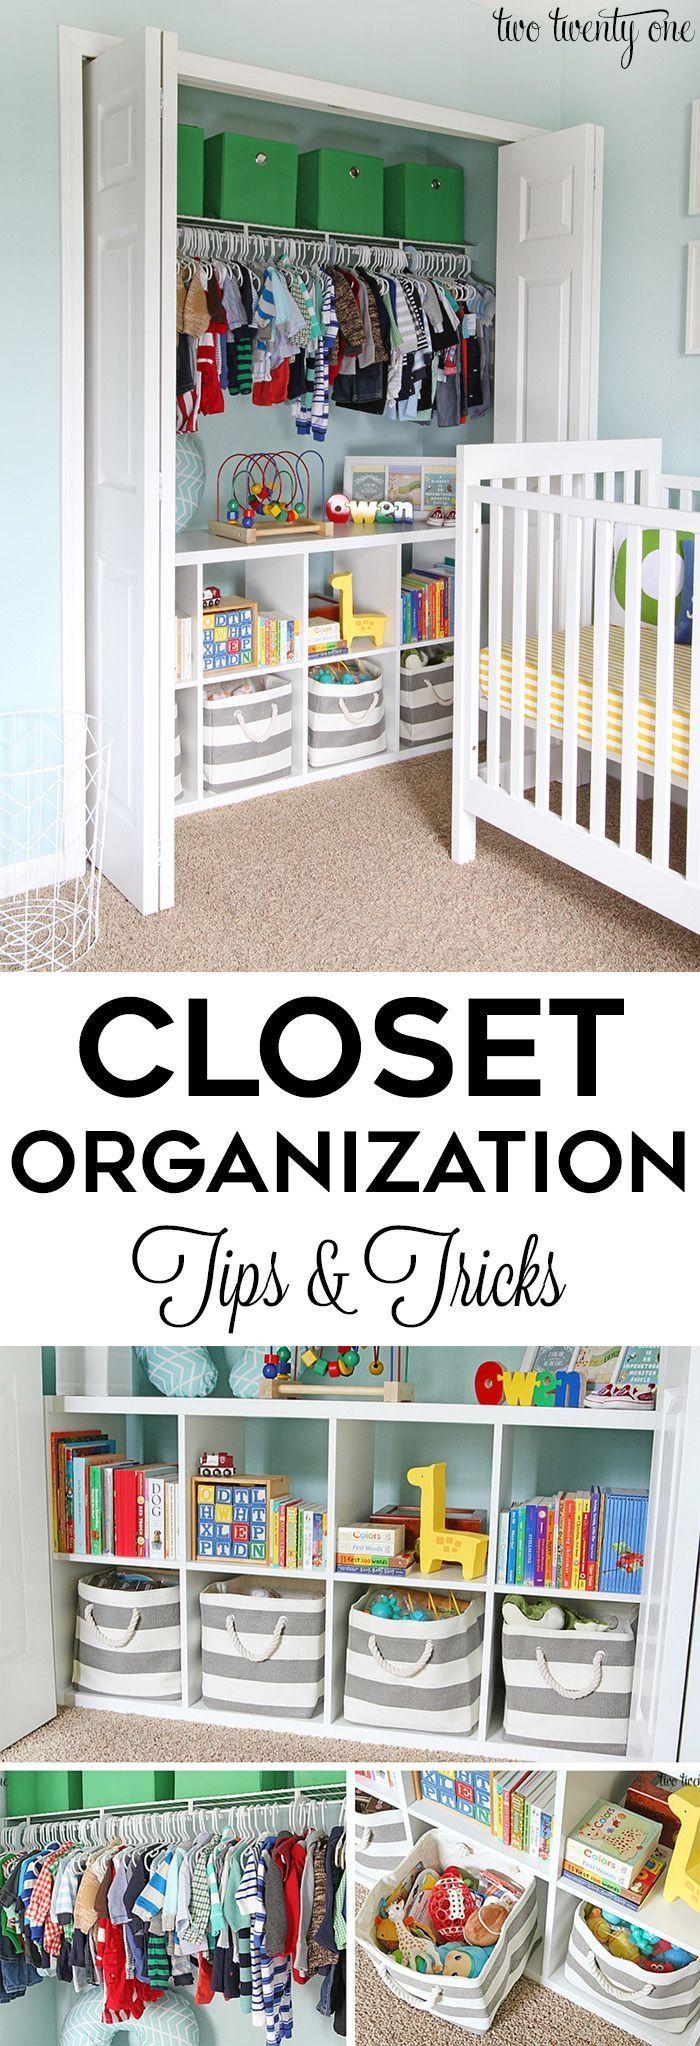 Nursery Closet   Pinterest   Closet organization, Organizations and Room